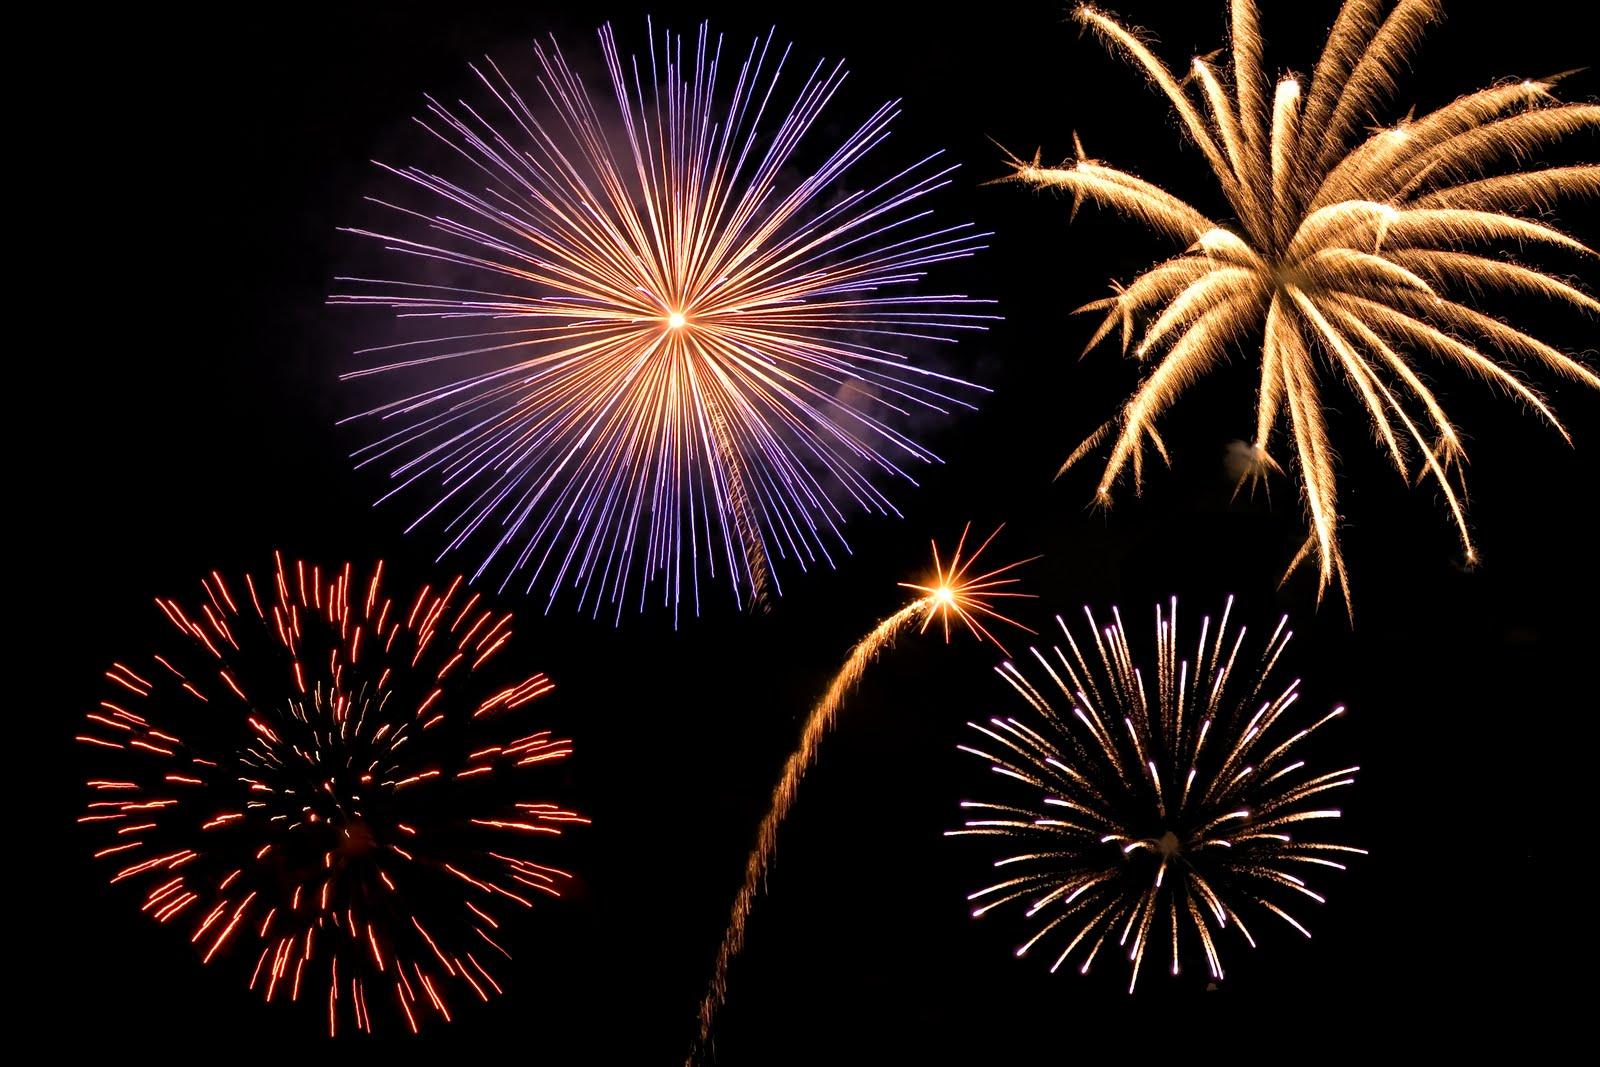 Fireworks clipart enjoyment Amazing GIF Merry GIF 2014